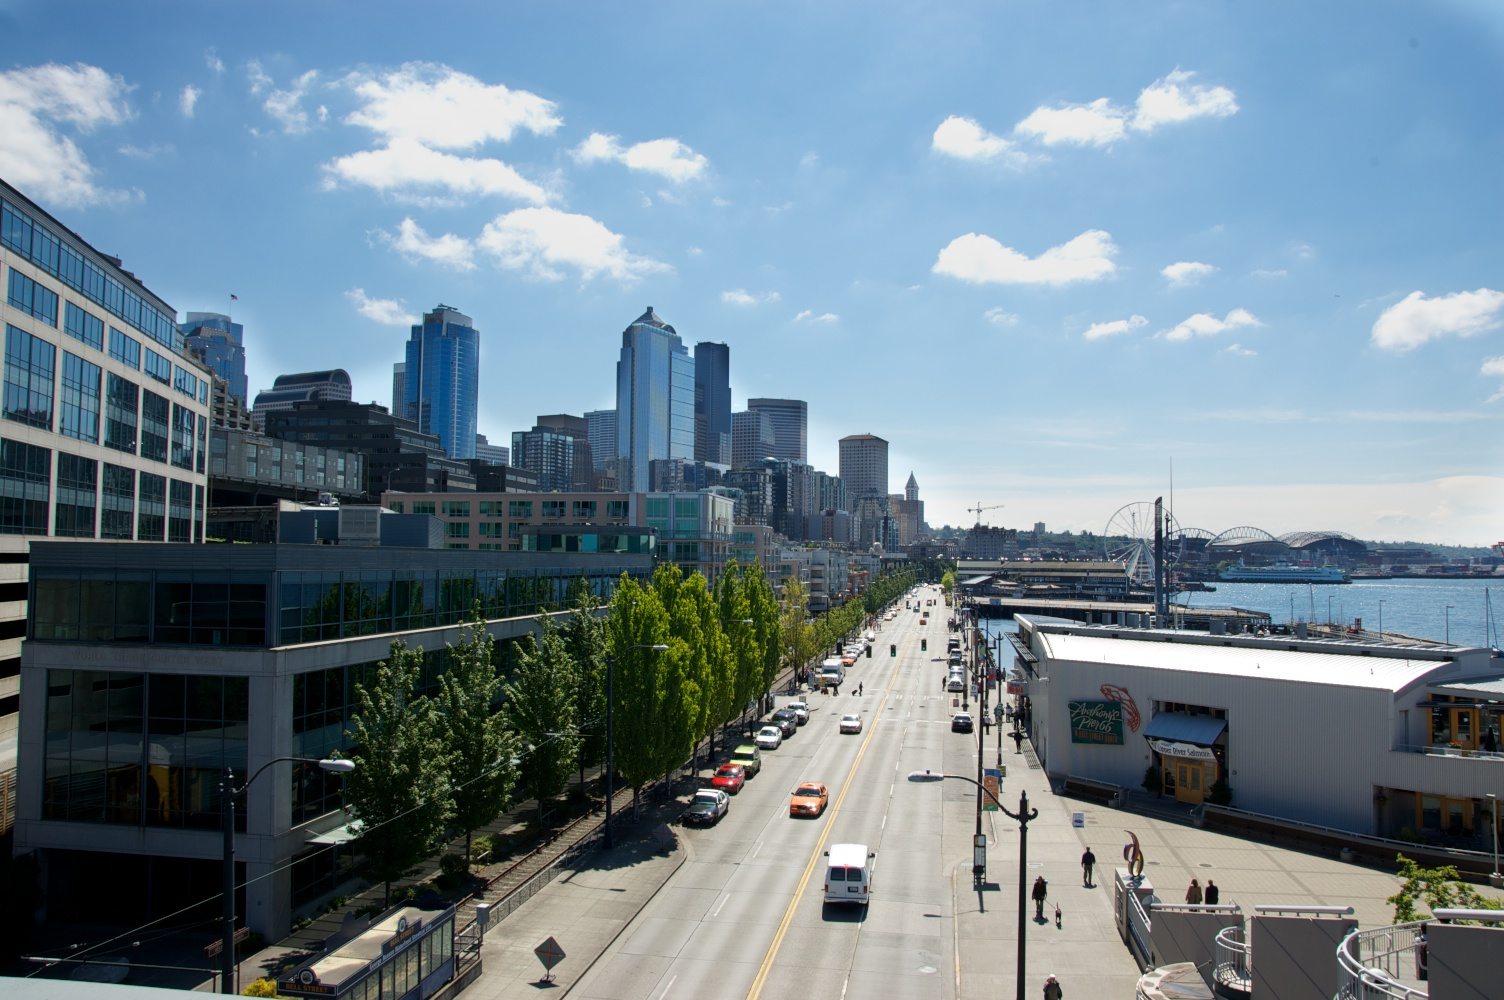 Seattle - Savannah Page 1